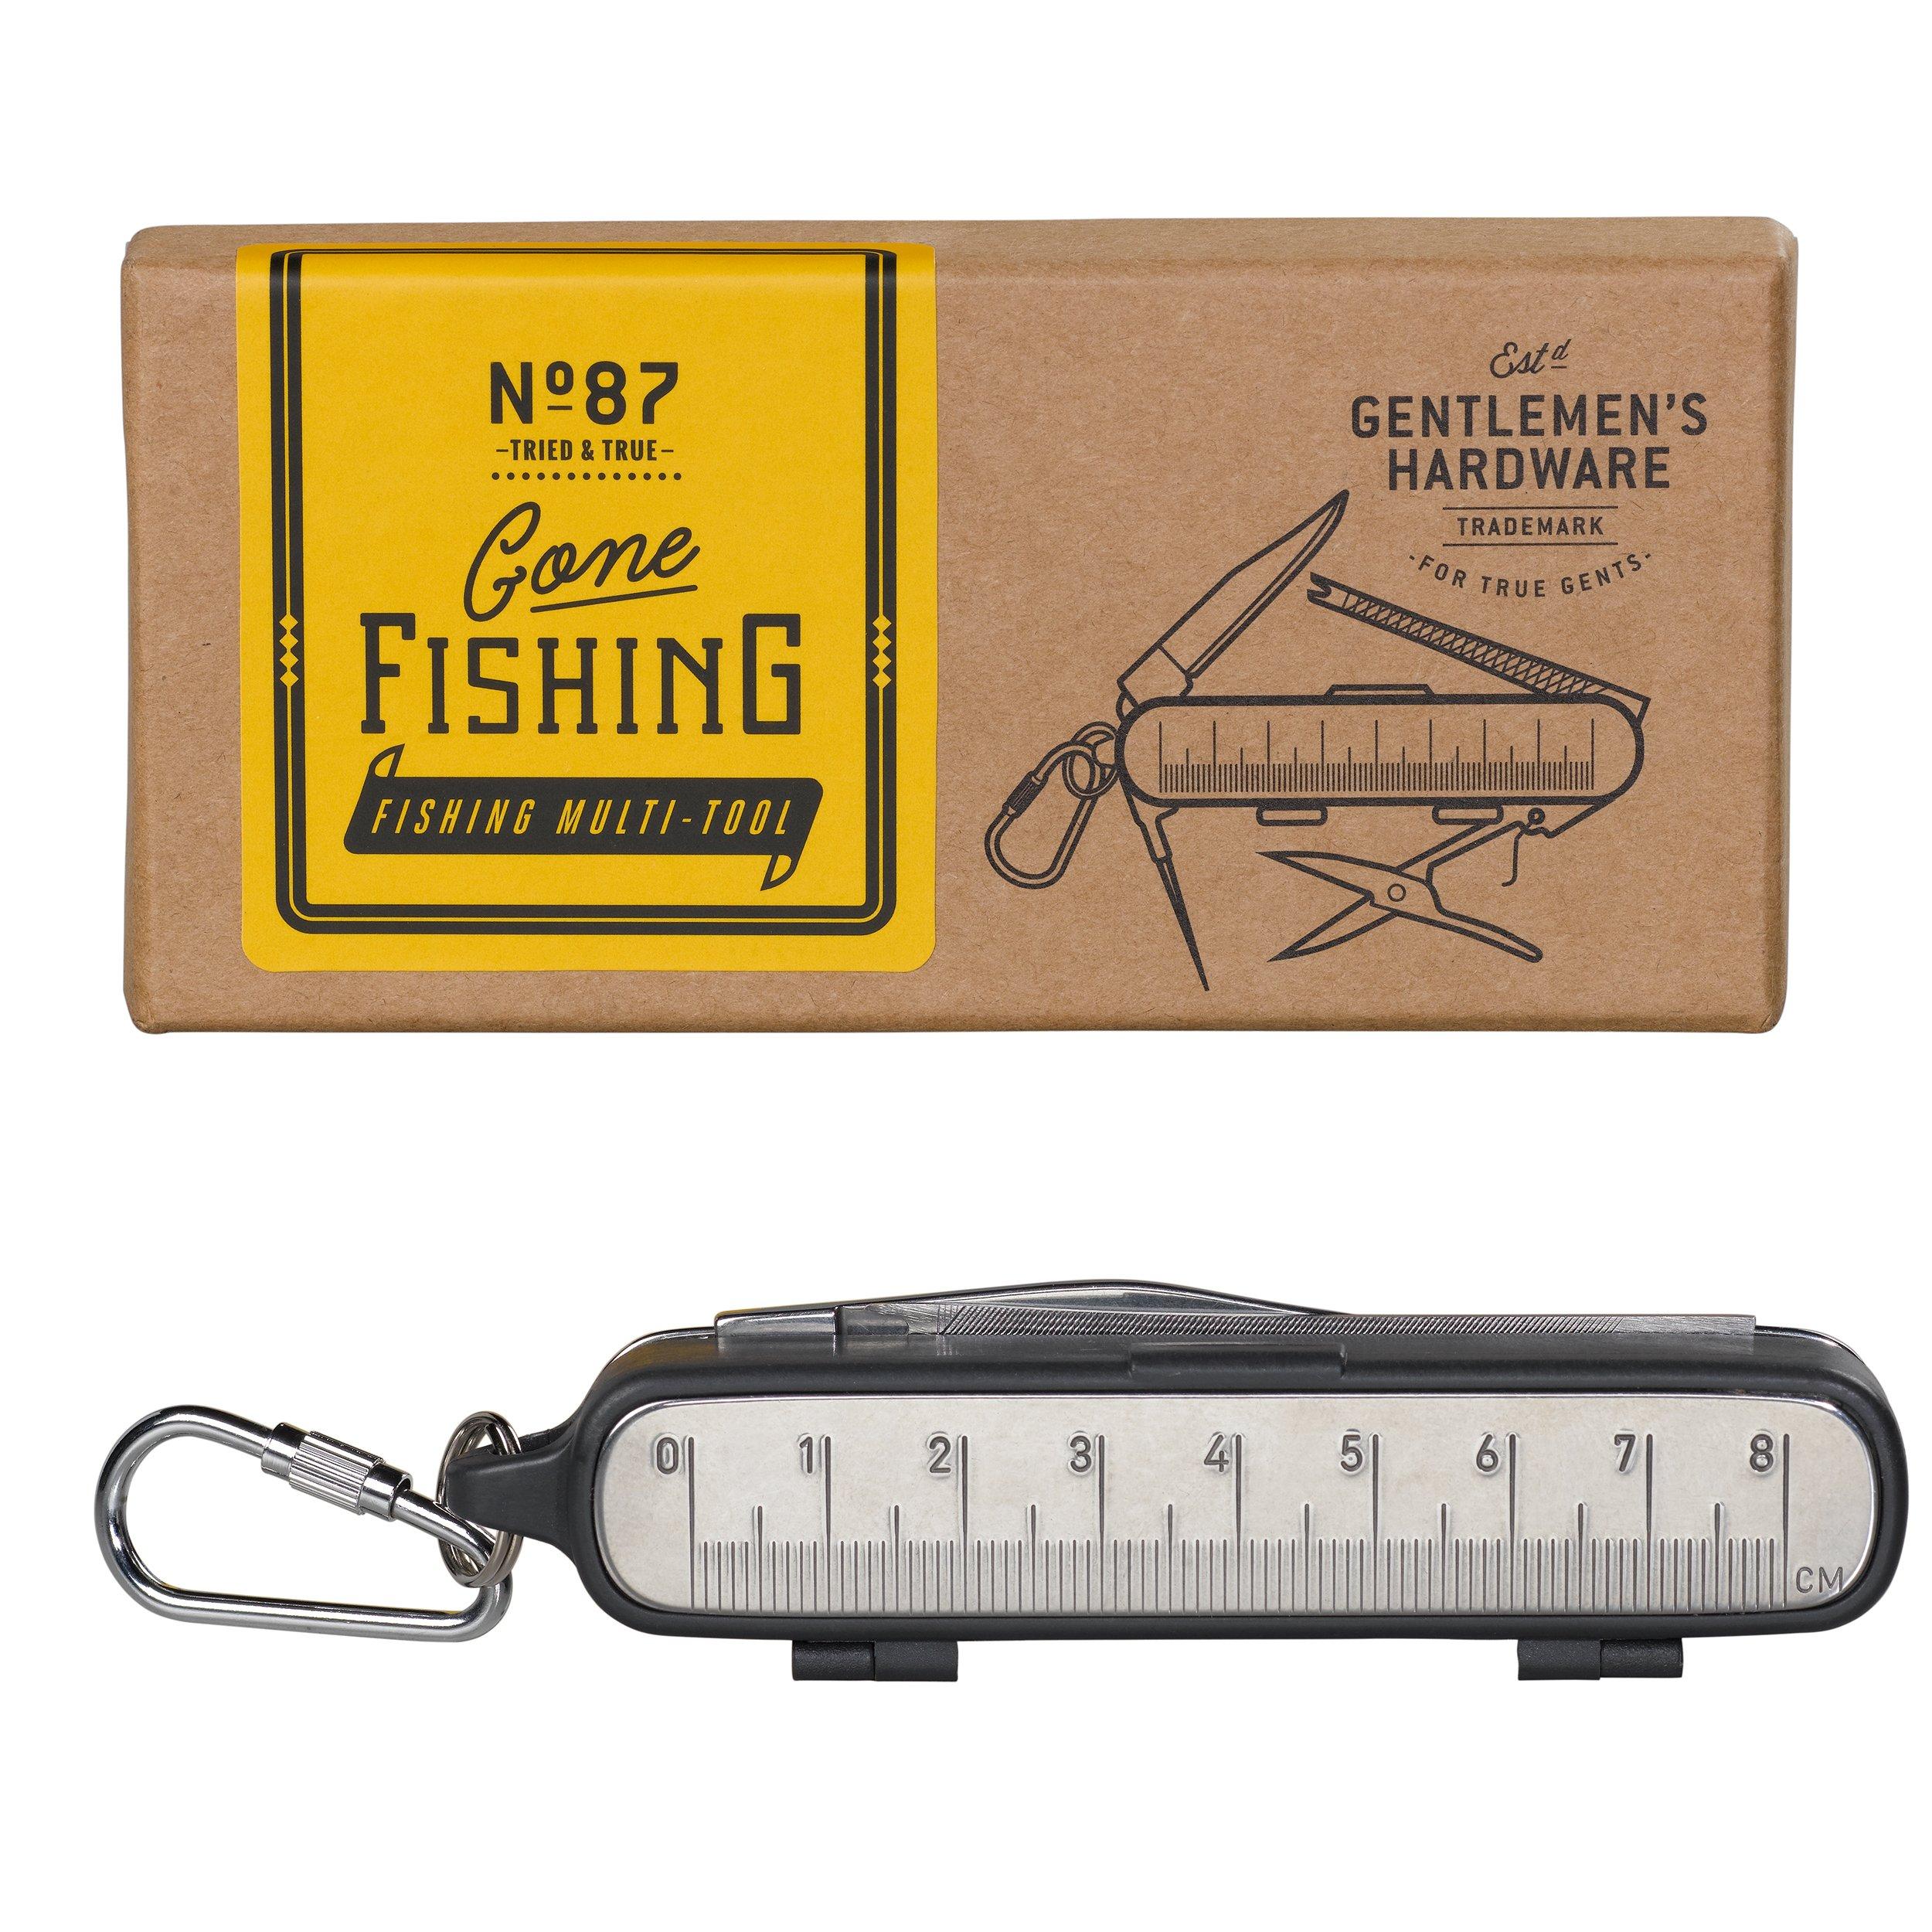 Gentlemen's Hardware Fishing Multitool